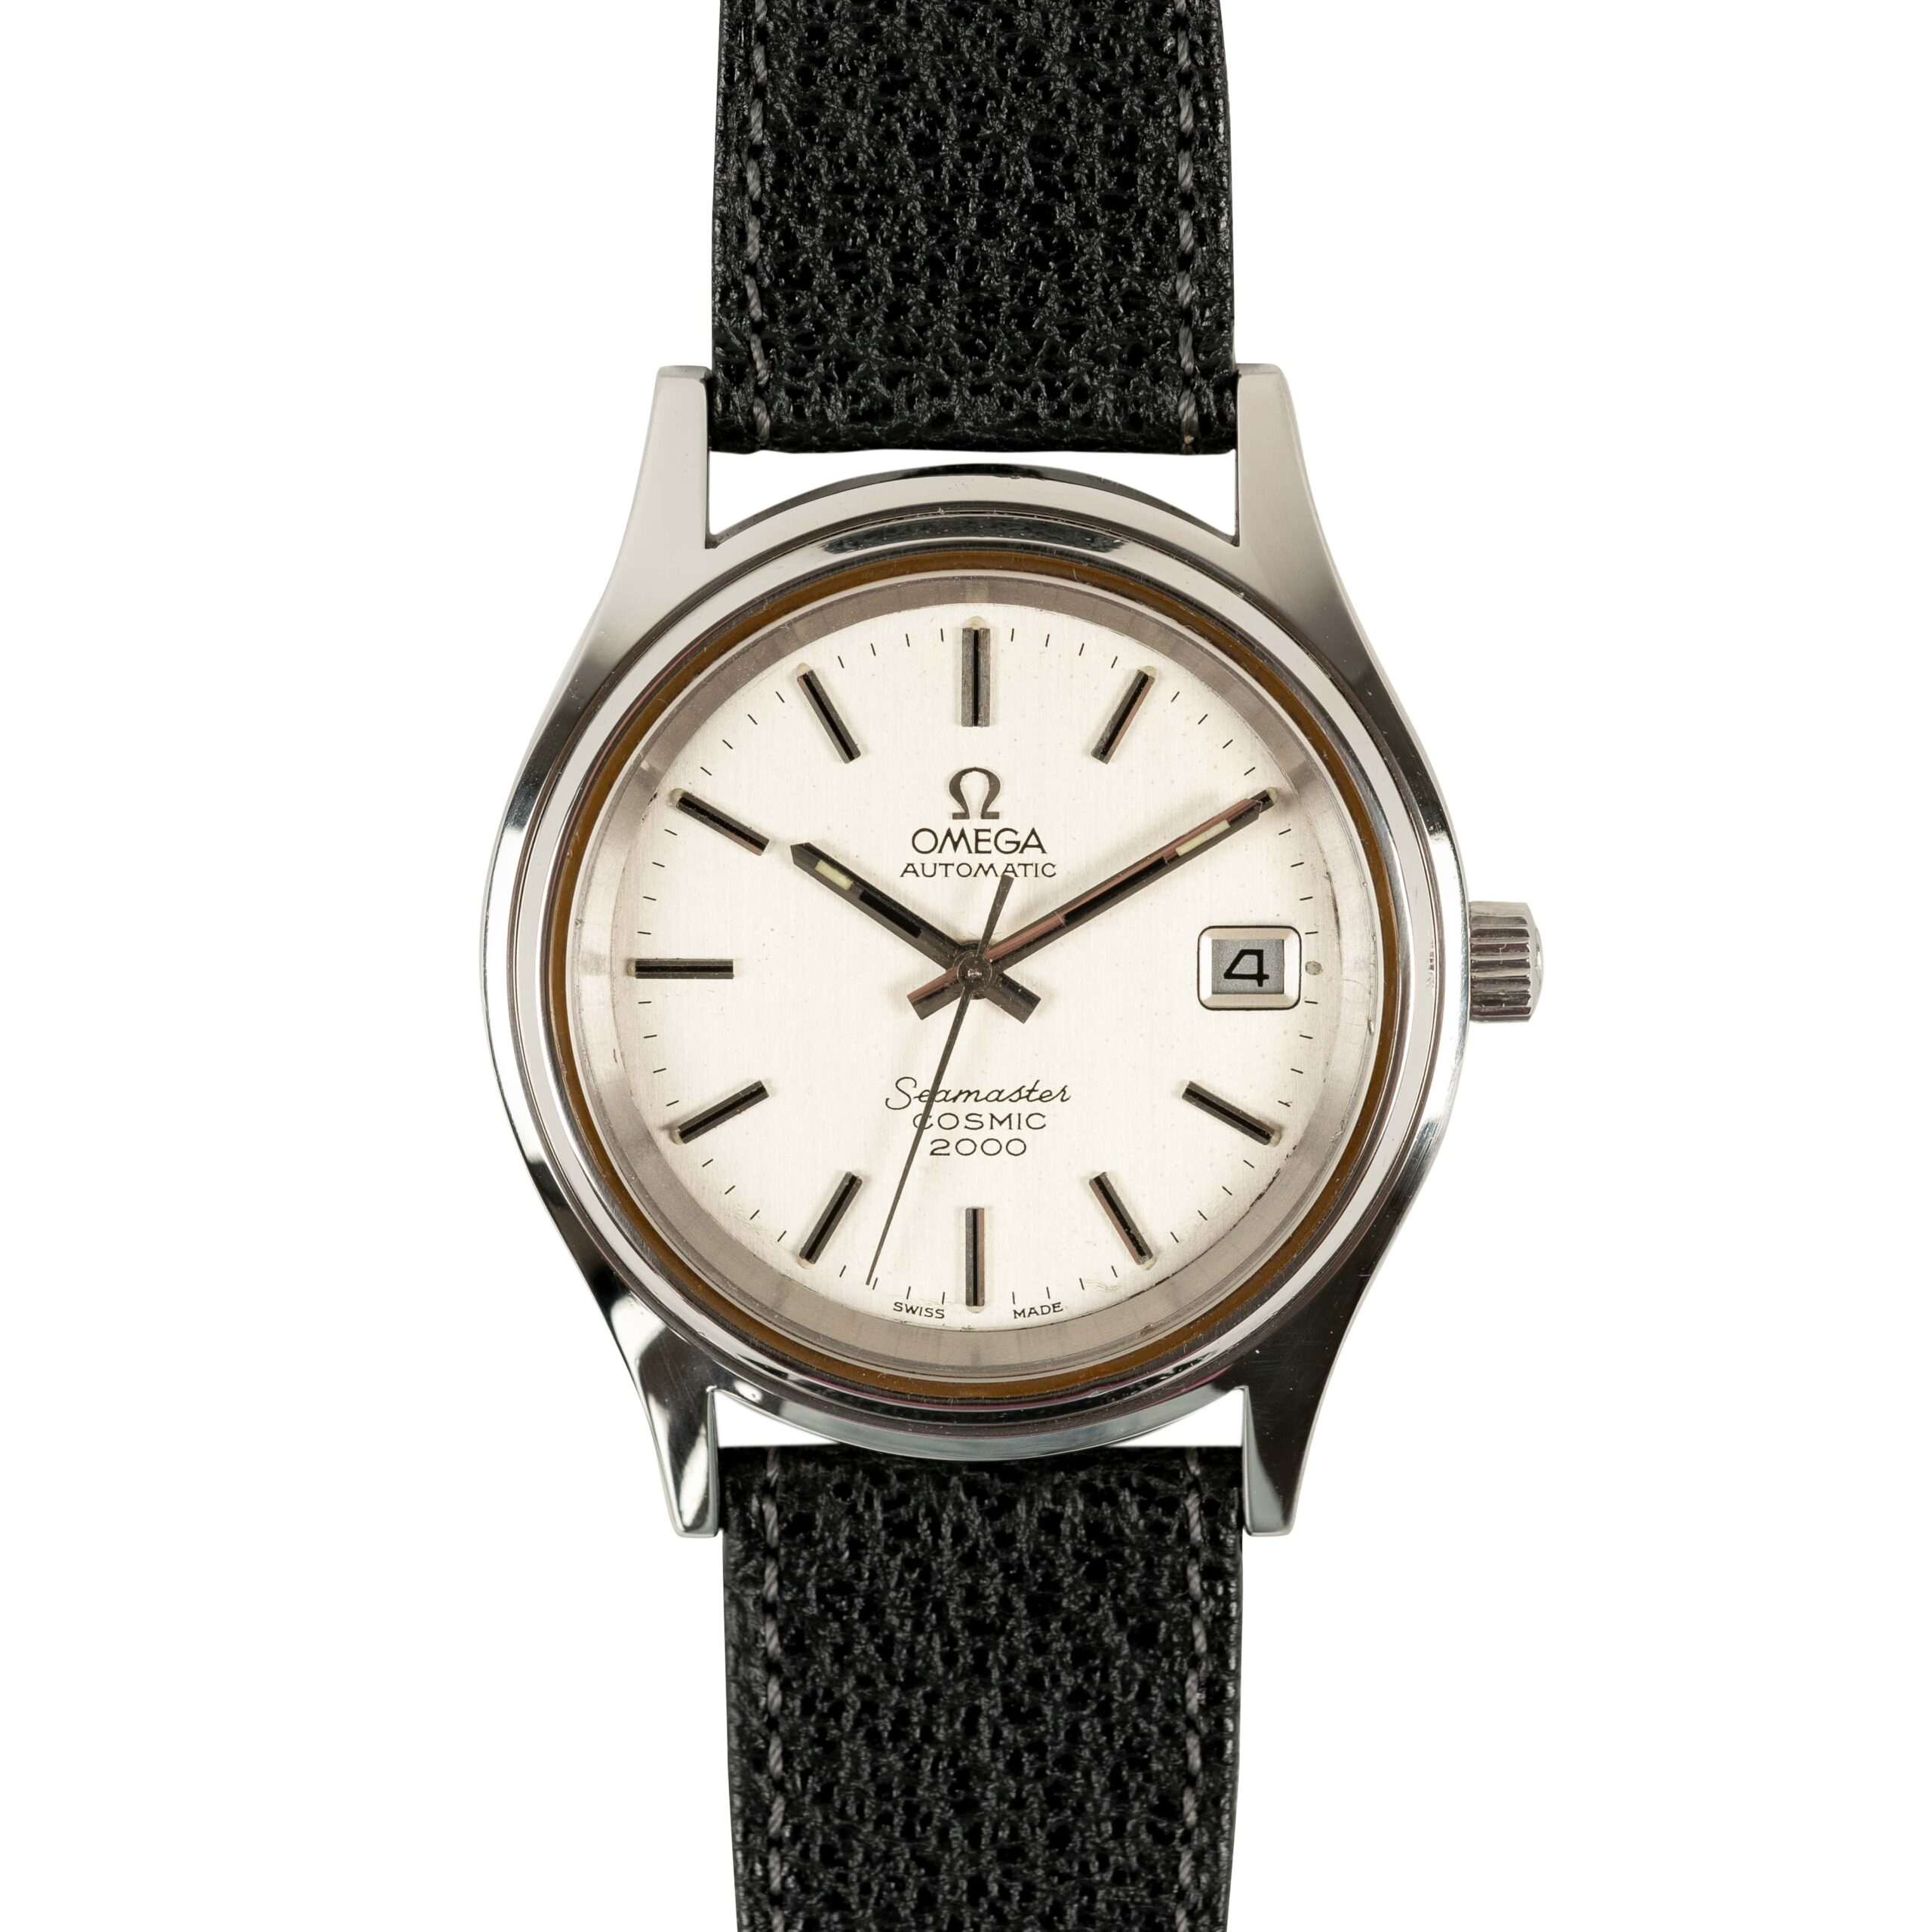 vintage omega seamaster cosmic 2000 166.0218 watch